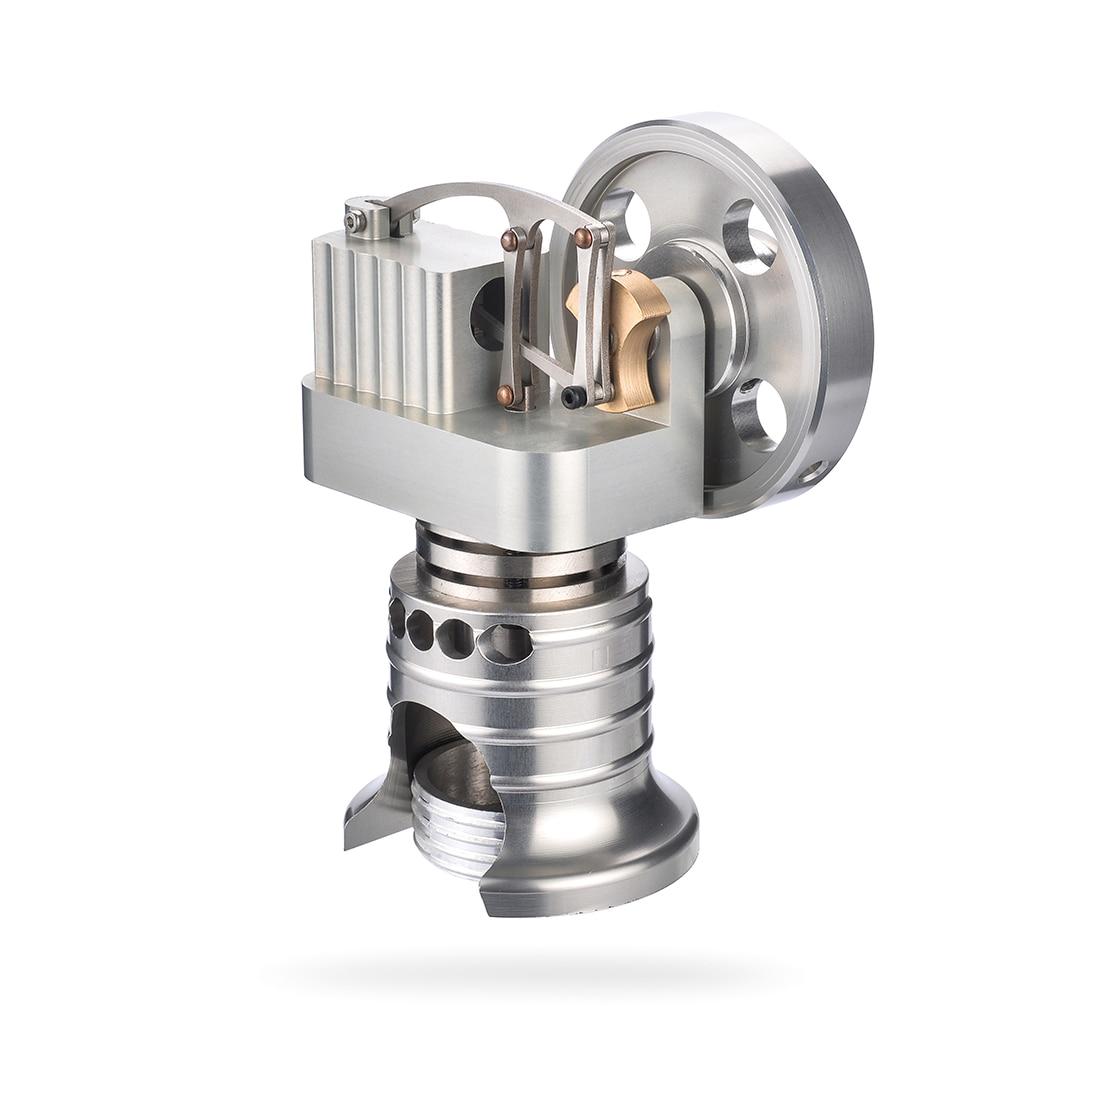 NFSTRIKE Model Building Kits Vertical Type Metal Stirling Engine Motor with Alcohol Burner Kids Early Development